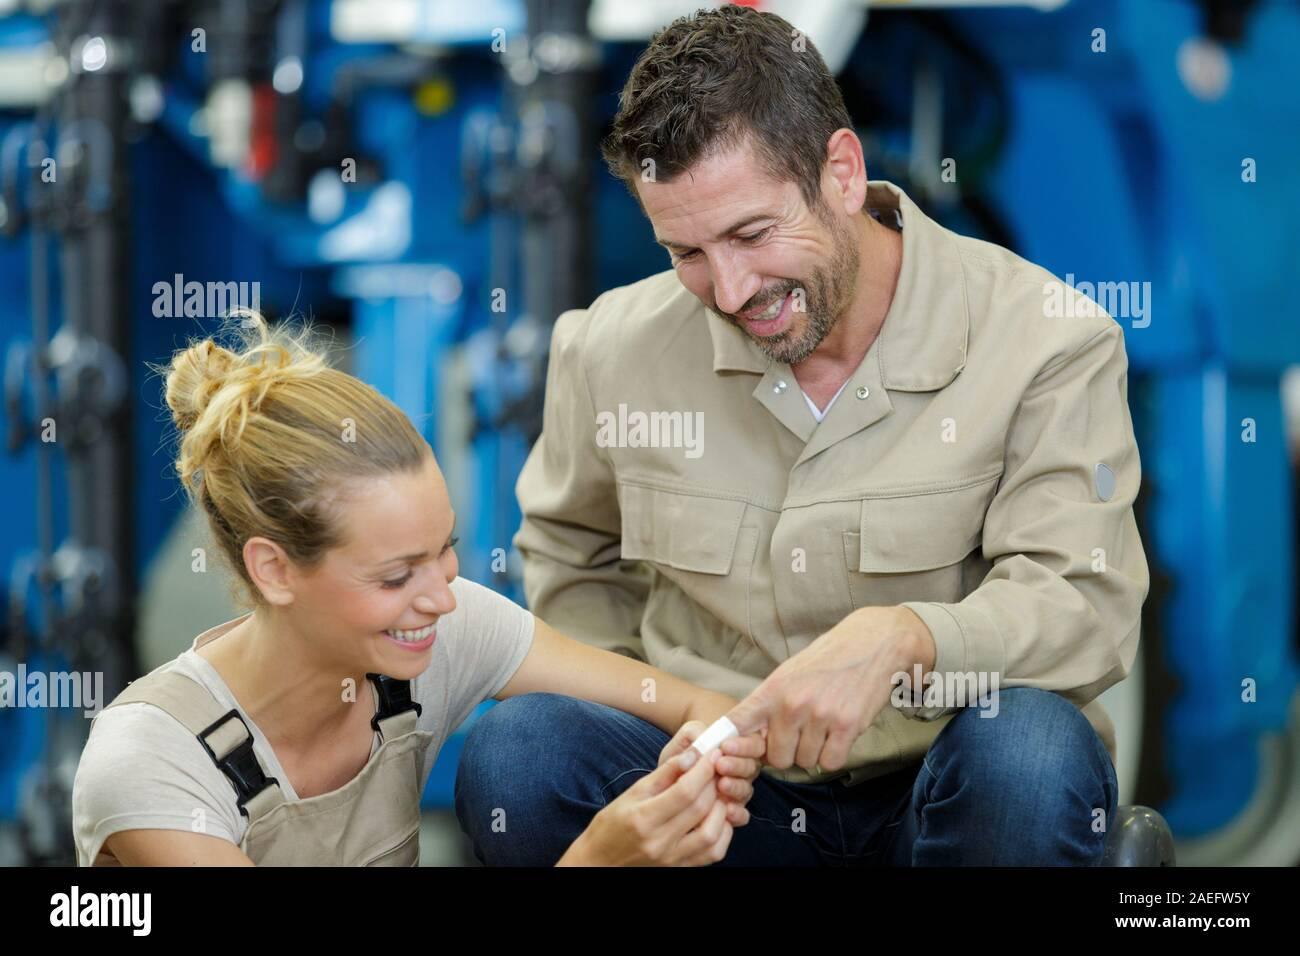 woman helping an injured man Stock Photo